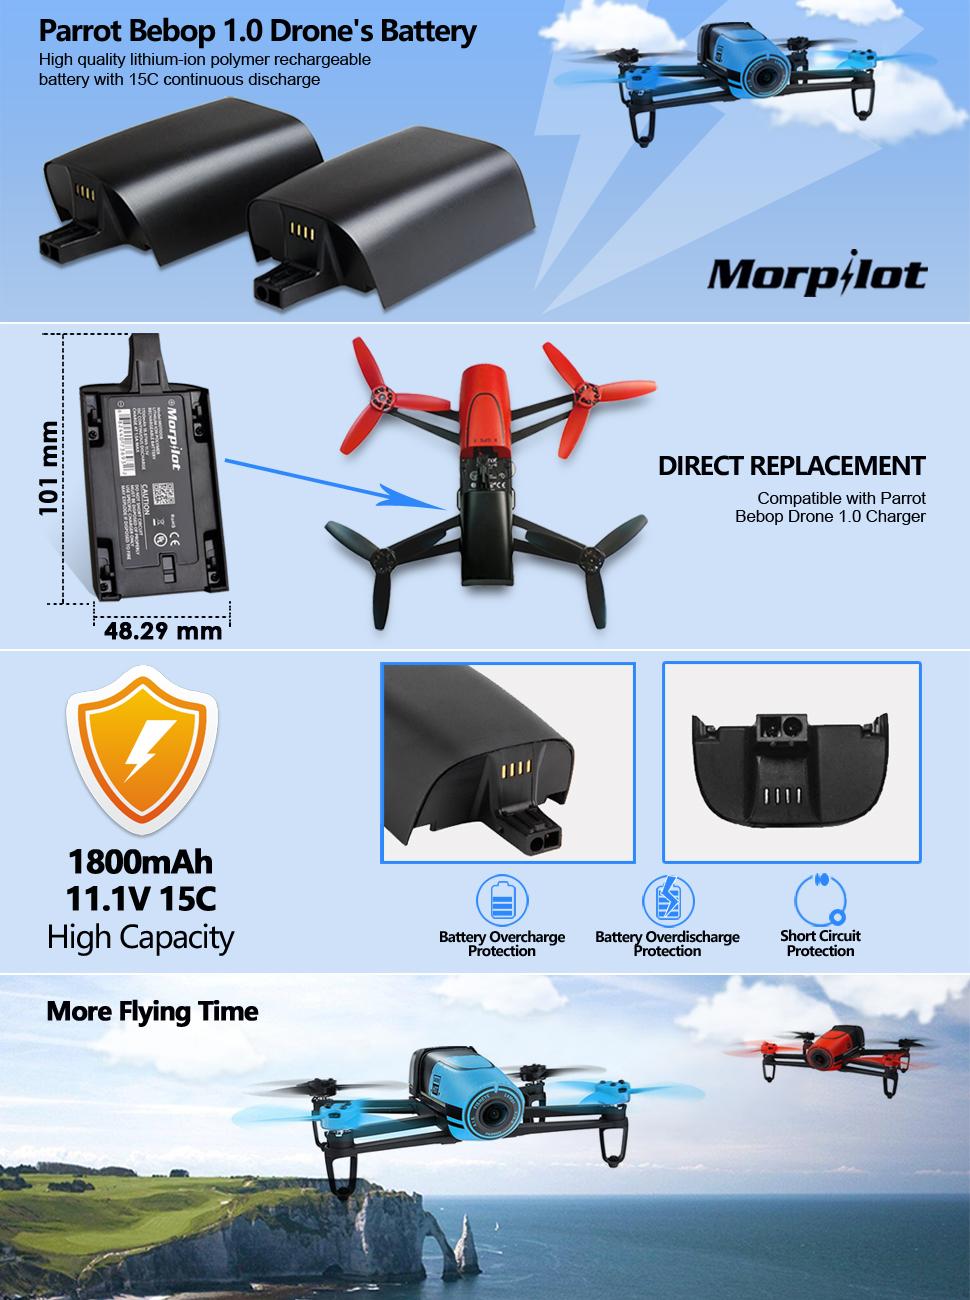 Commander avis drone pegasus gps et avis drone camera rate in india